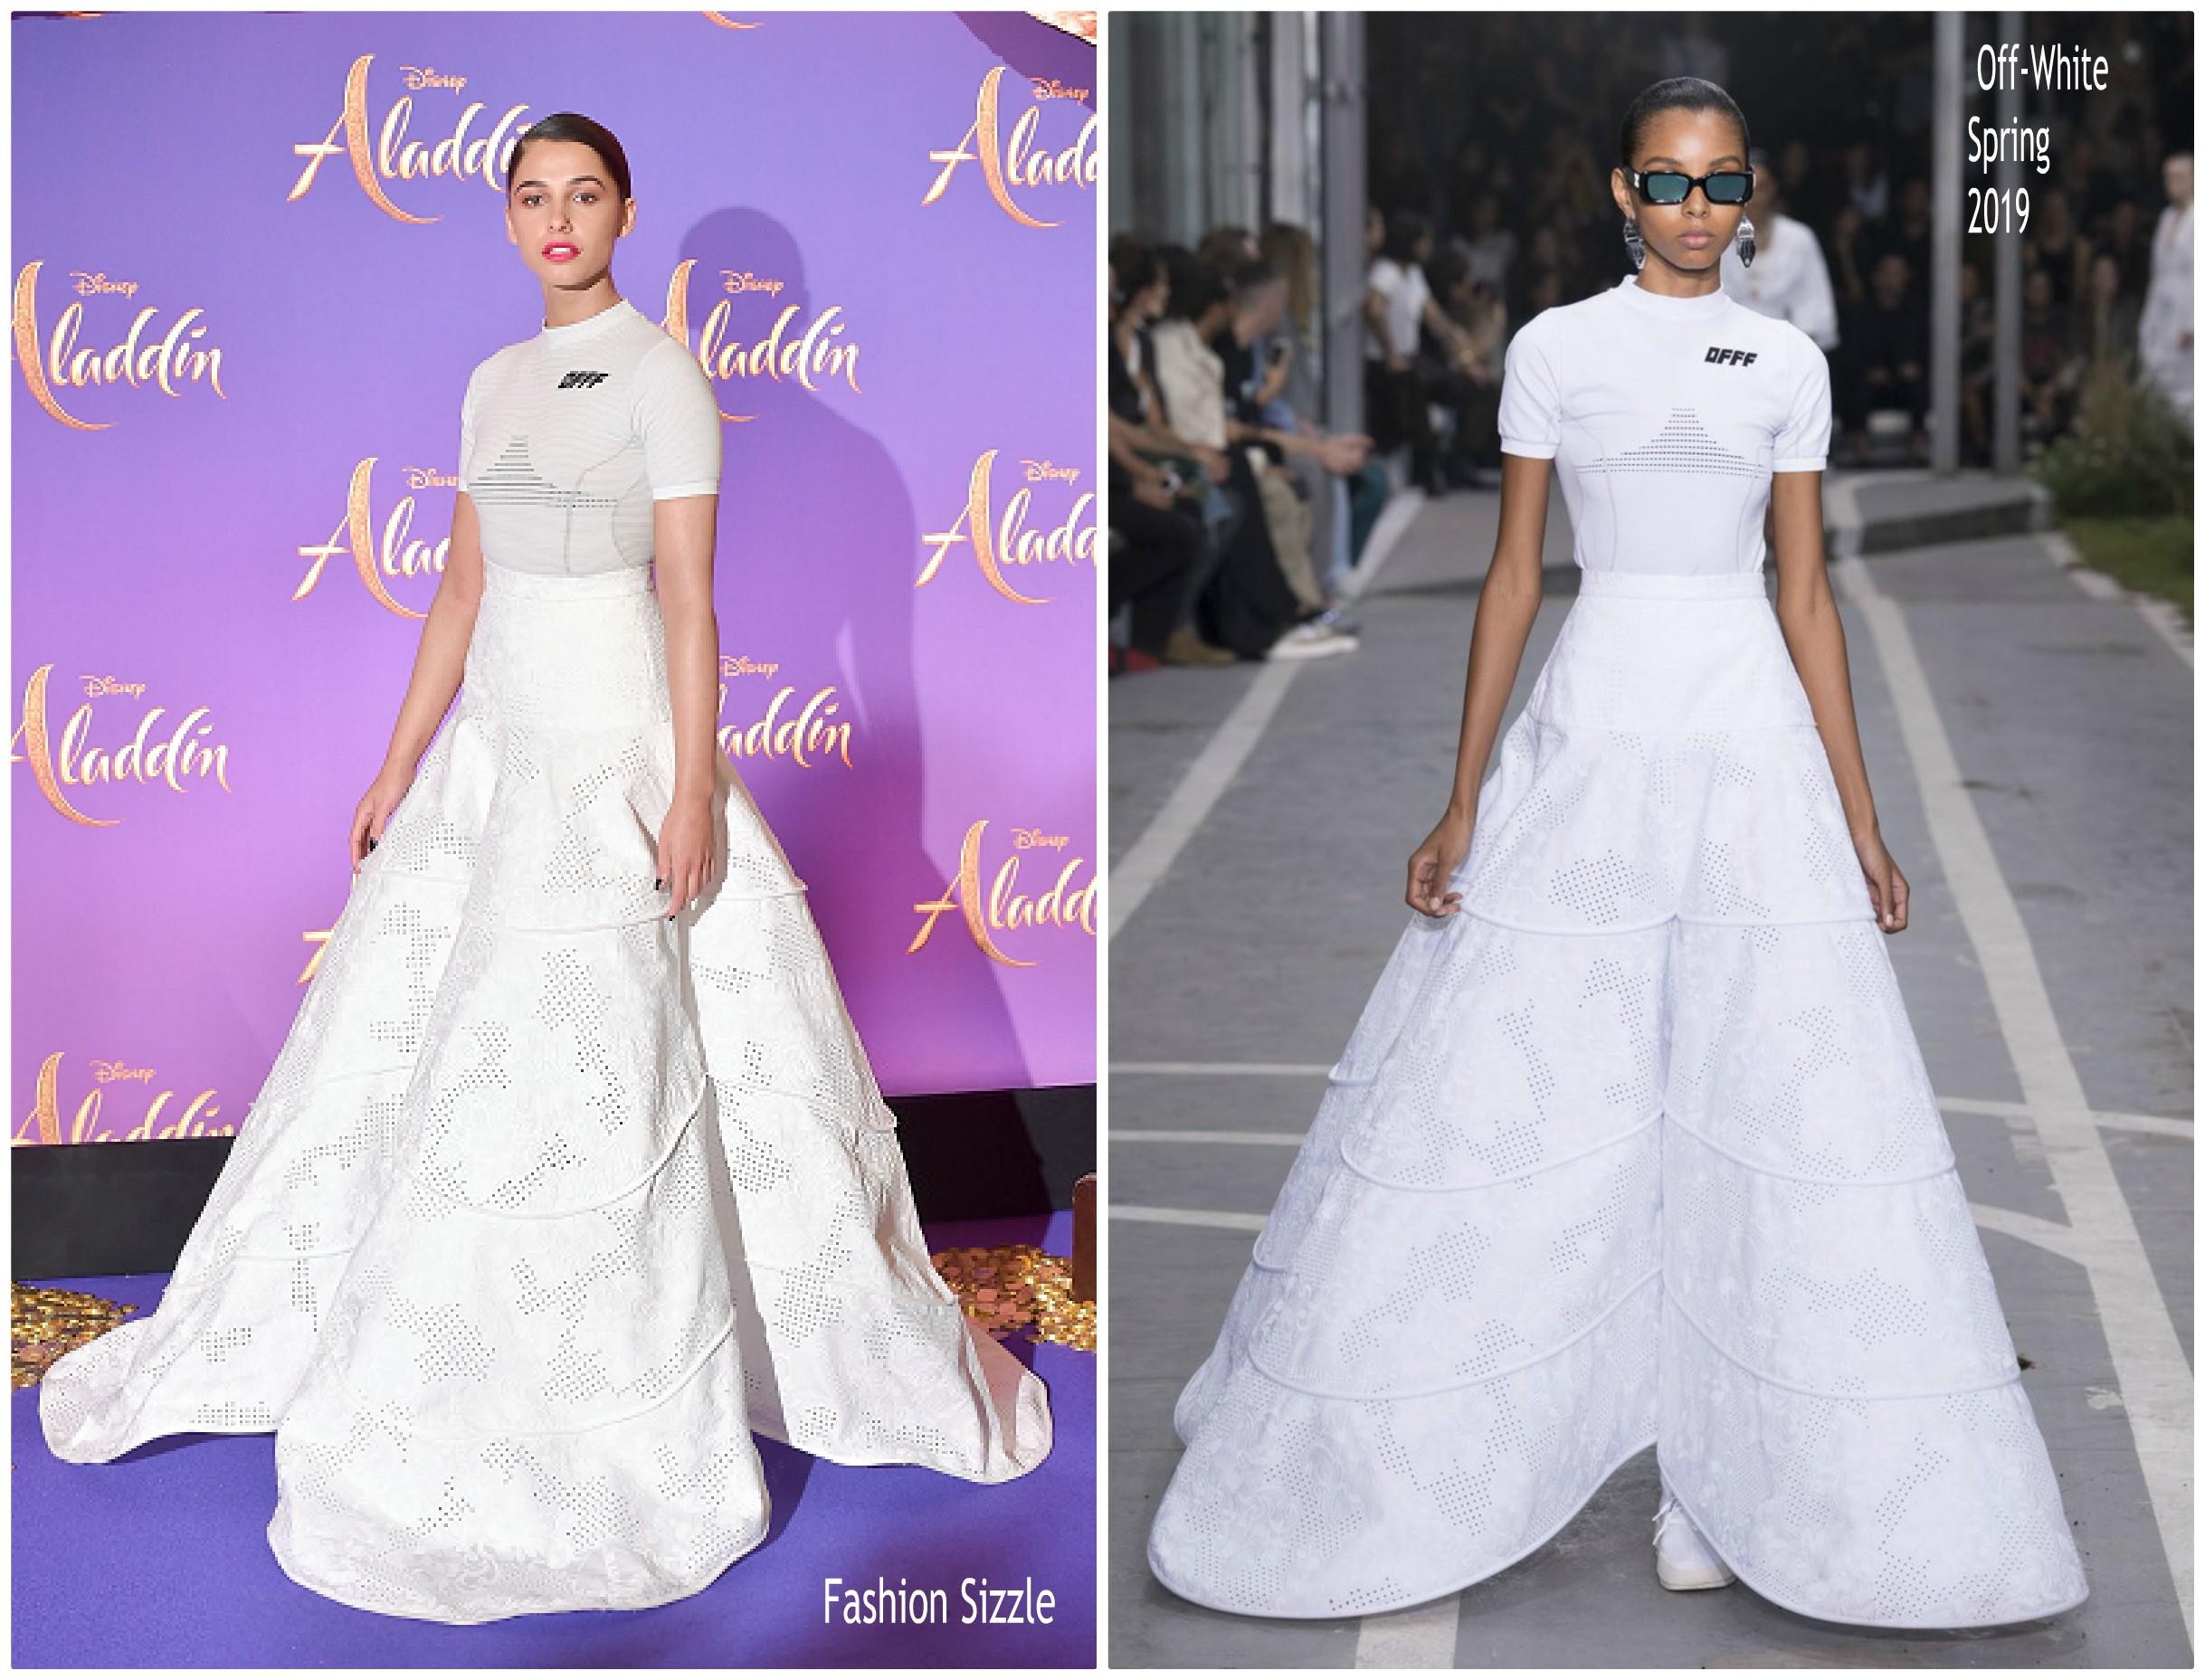 naomi-scott-in-off-white-aladdin-paris-premiere